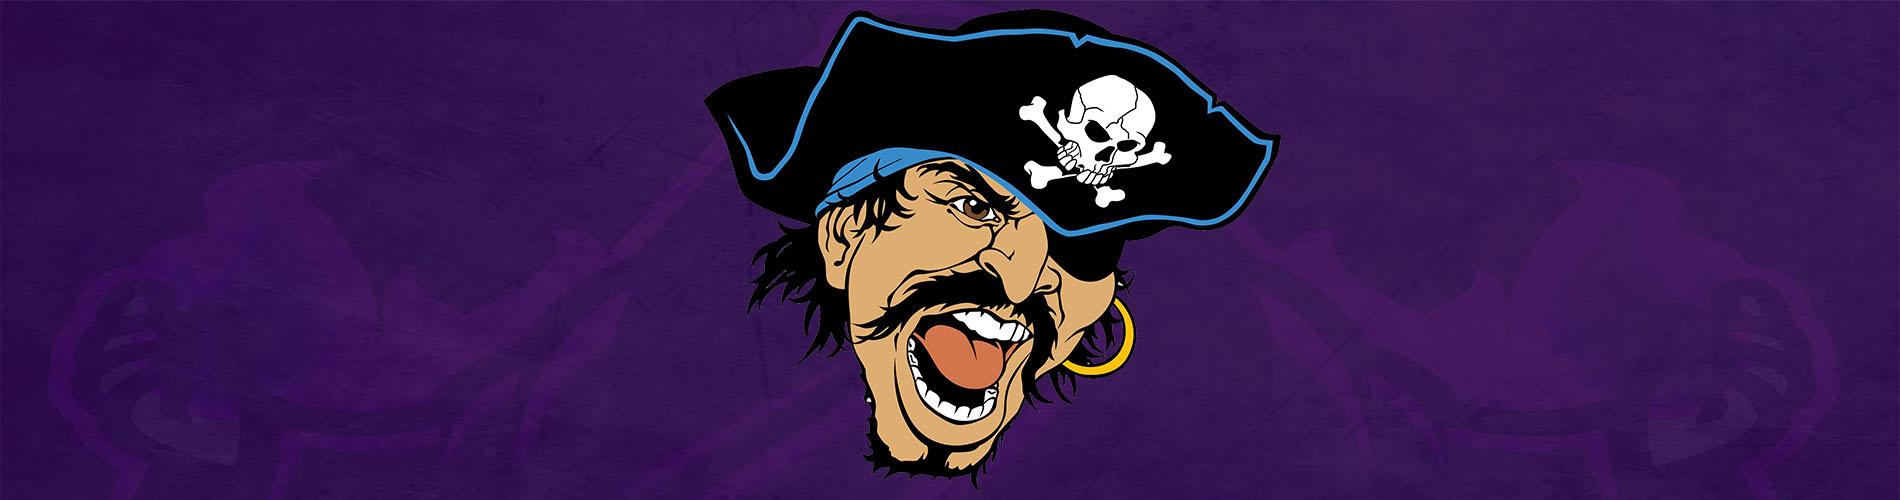 camisetas de piratas